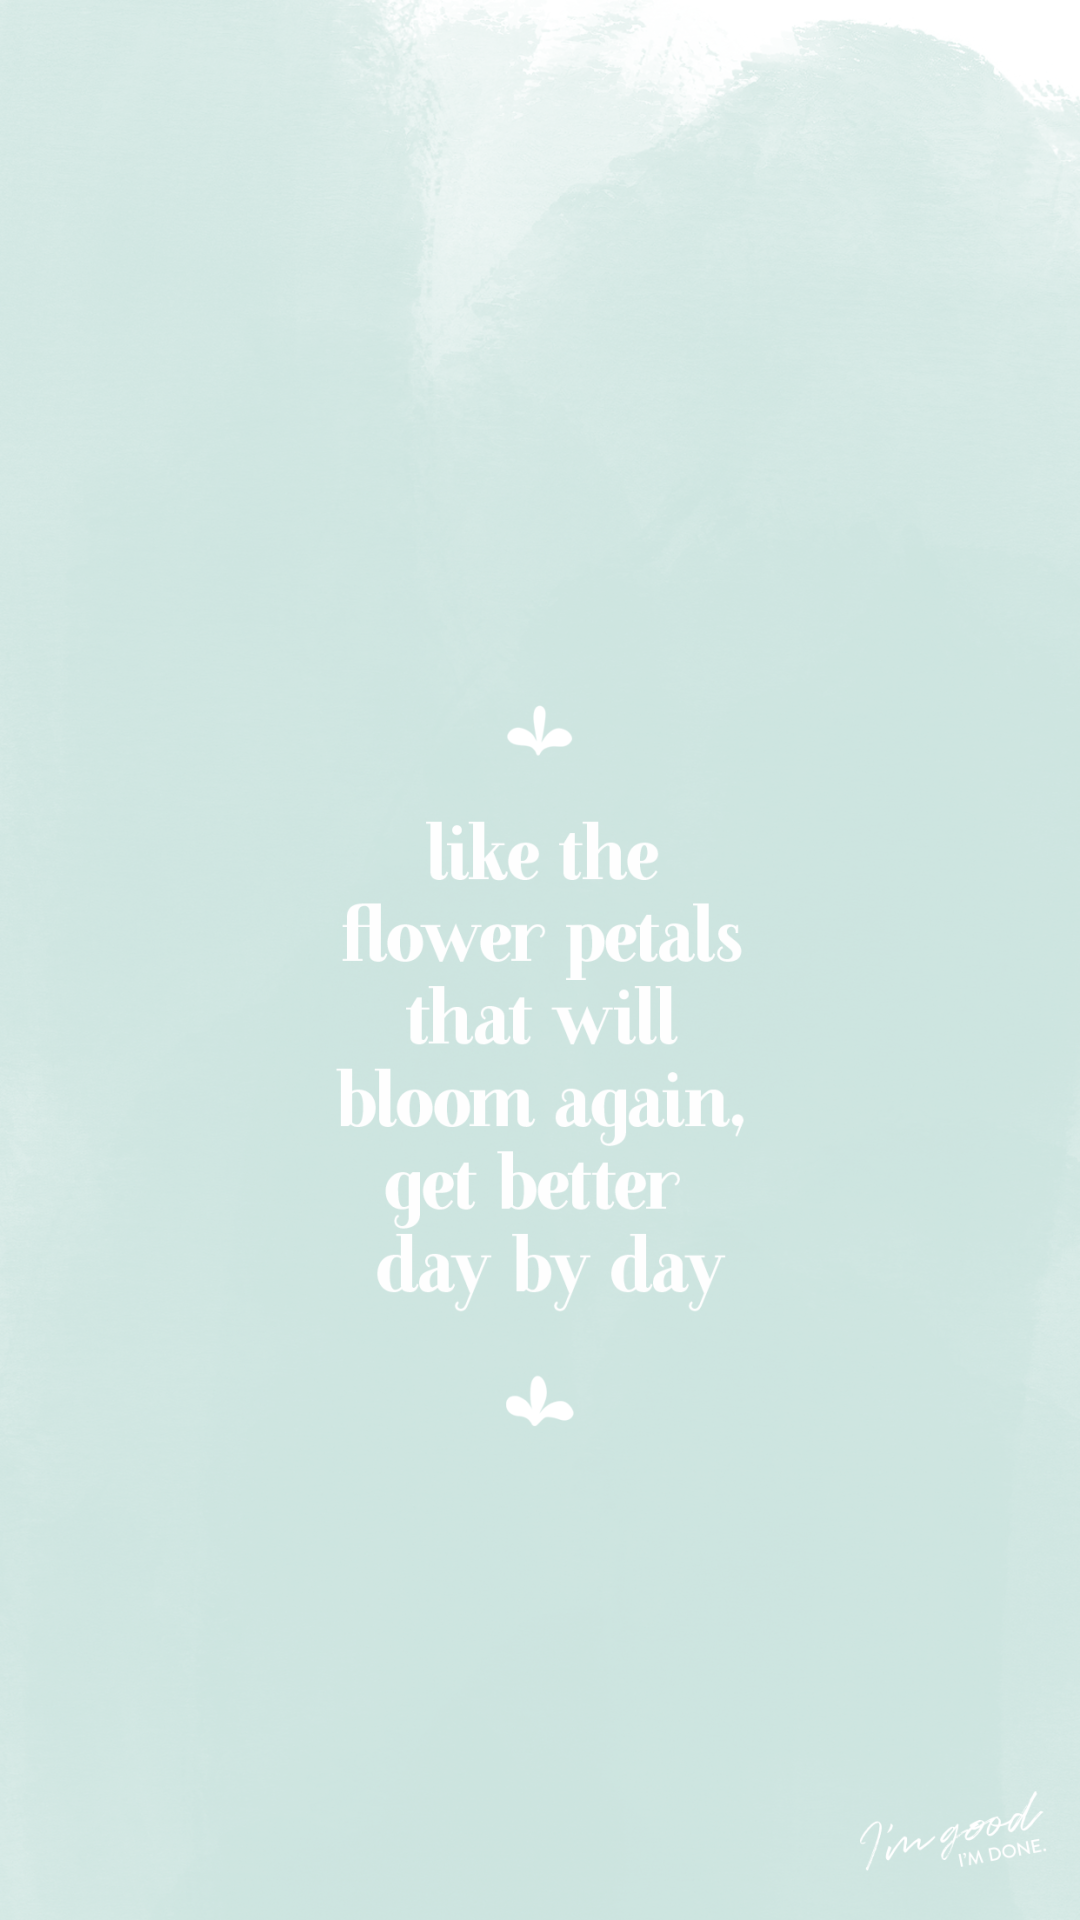 Mamamoo Wind Flower I M Slowly But Surely Catching Up For Lockscreen Use Only Do Not Remove Watermark P Song Lyrics Wallpaper Lyrics Aesthetic Mamamoo